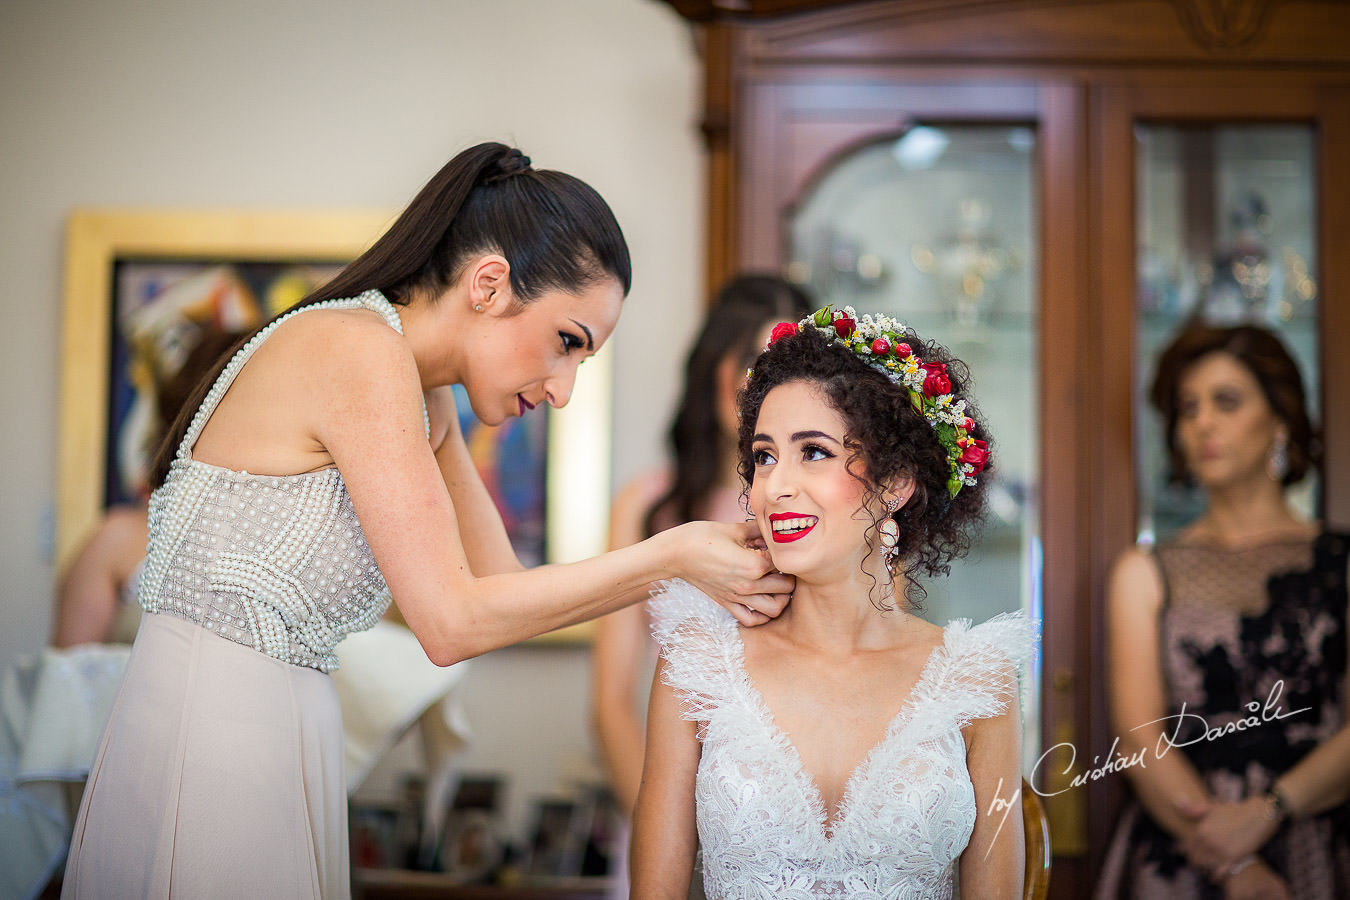 Koumera helping the bride, moments captured by Cyprus Wedding Photographer Cristian Dascalu at a beautiful wedding in Larnaka, Cyprus.